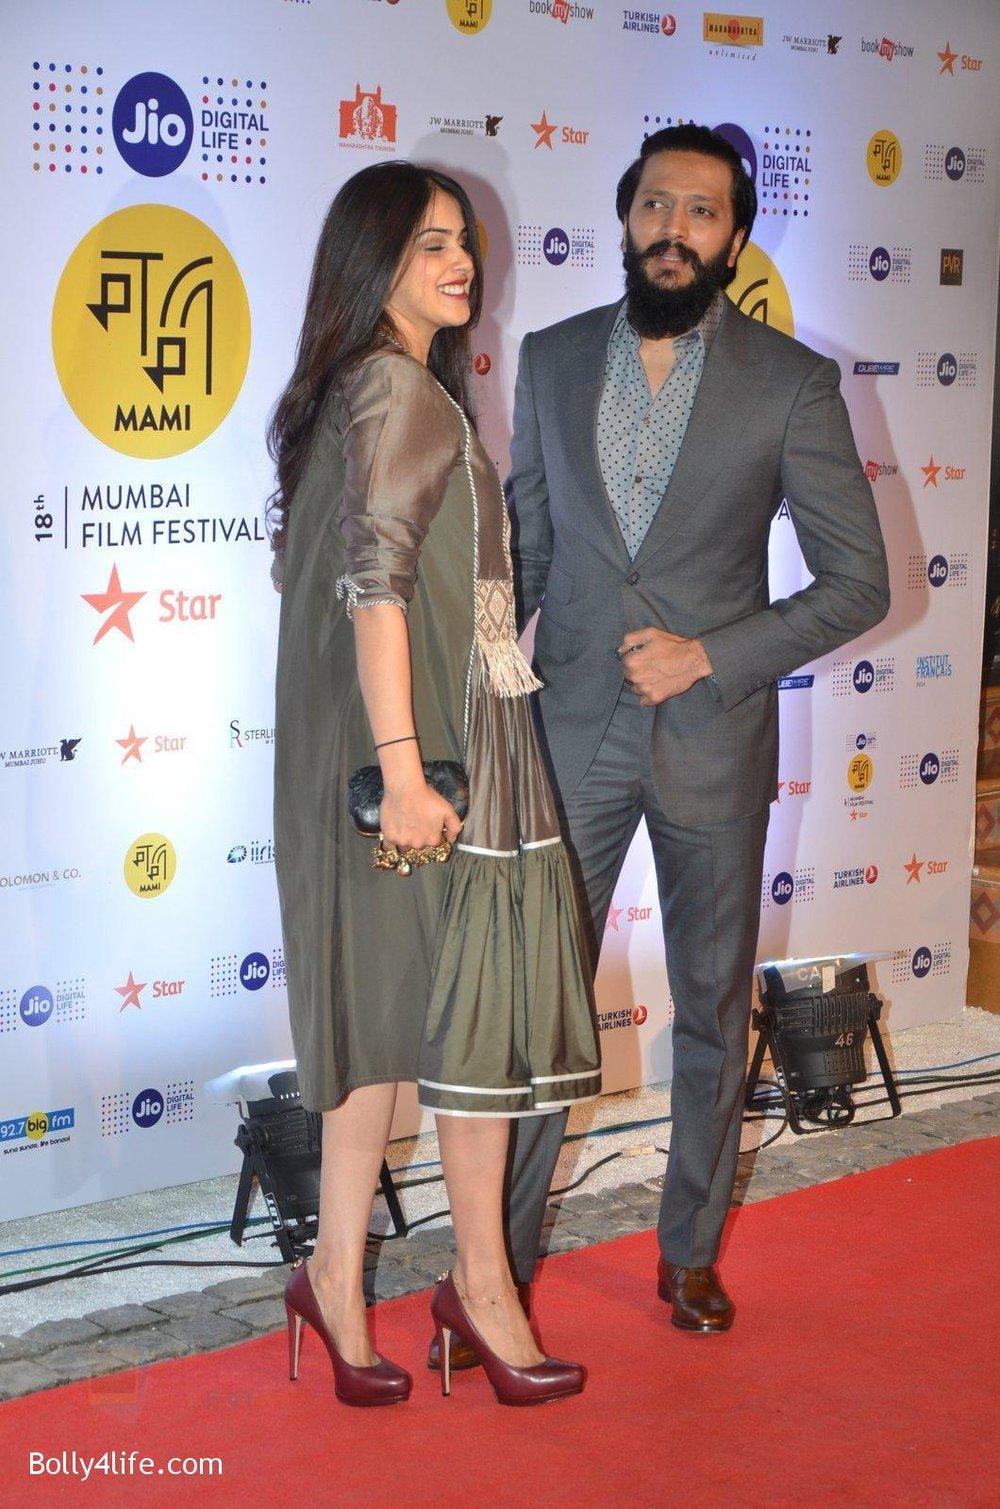 Genelia-D-Souza-Riteish-Deshmukh-at-MAMI-Film-Festival-2016-on-20th-Oct-2016-113.jpg